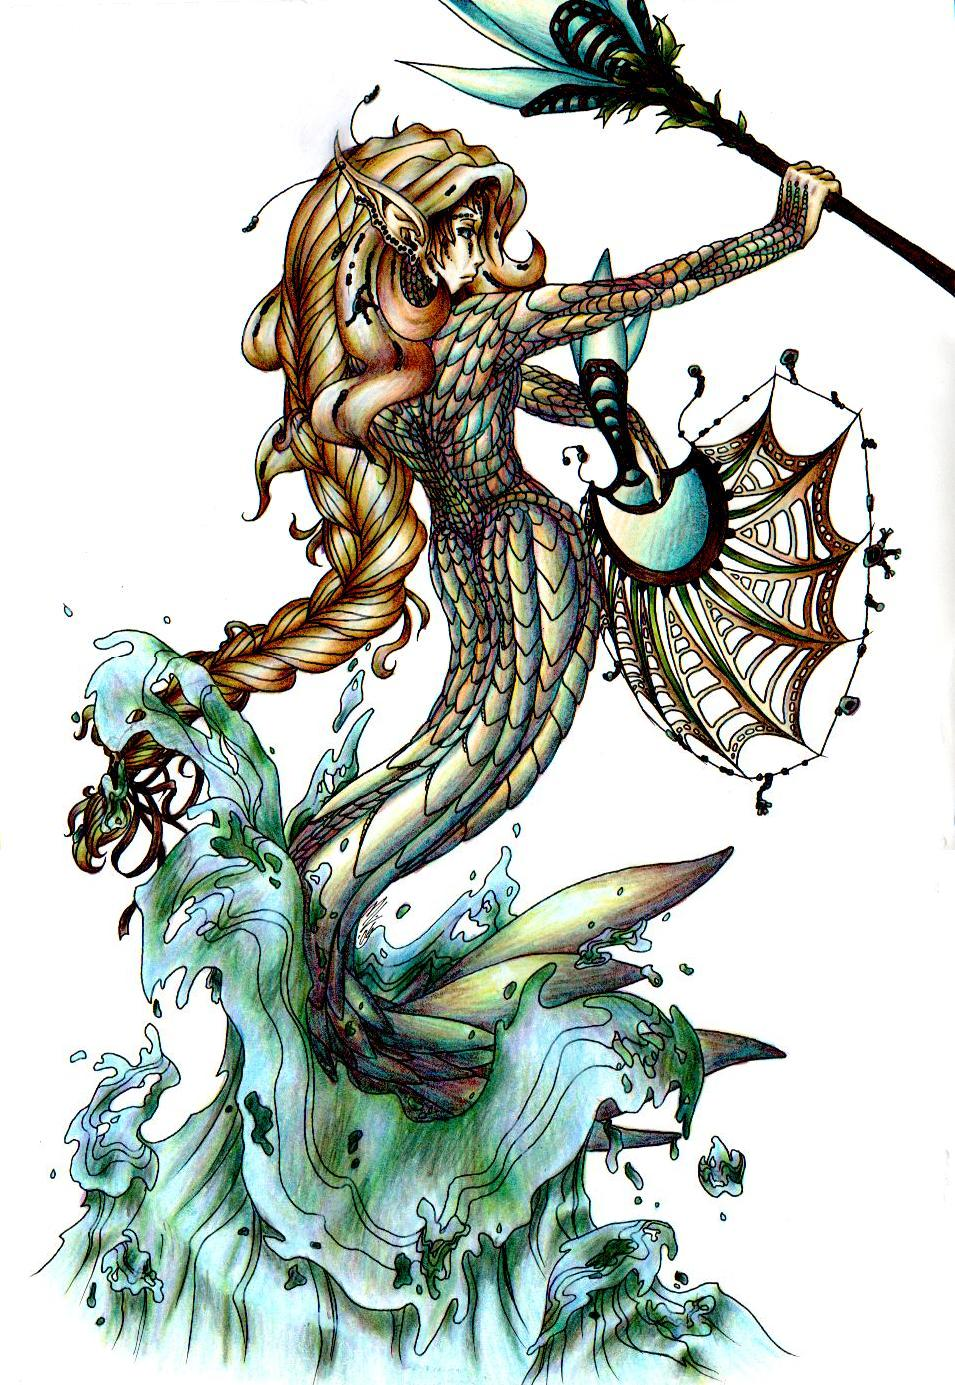 Krailah the Nile Mermaiden by theblackbutterfly